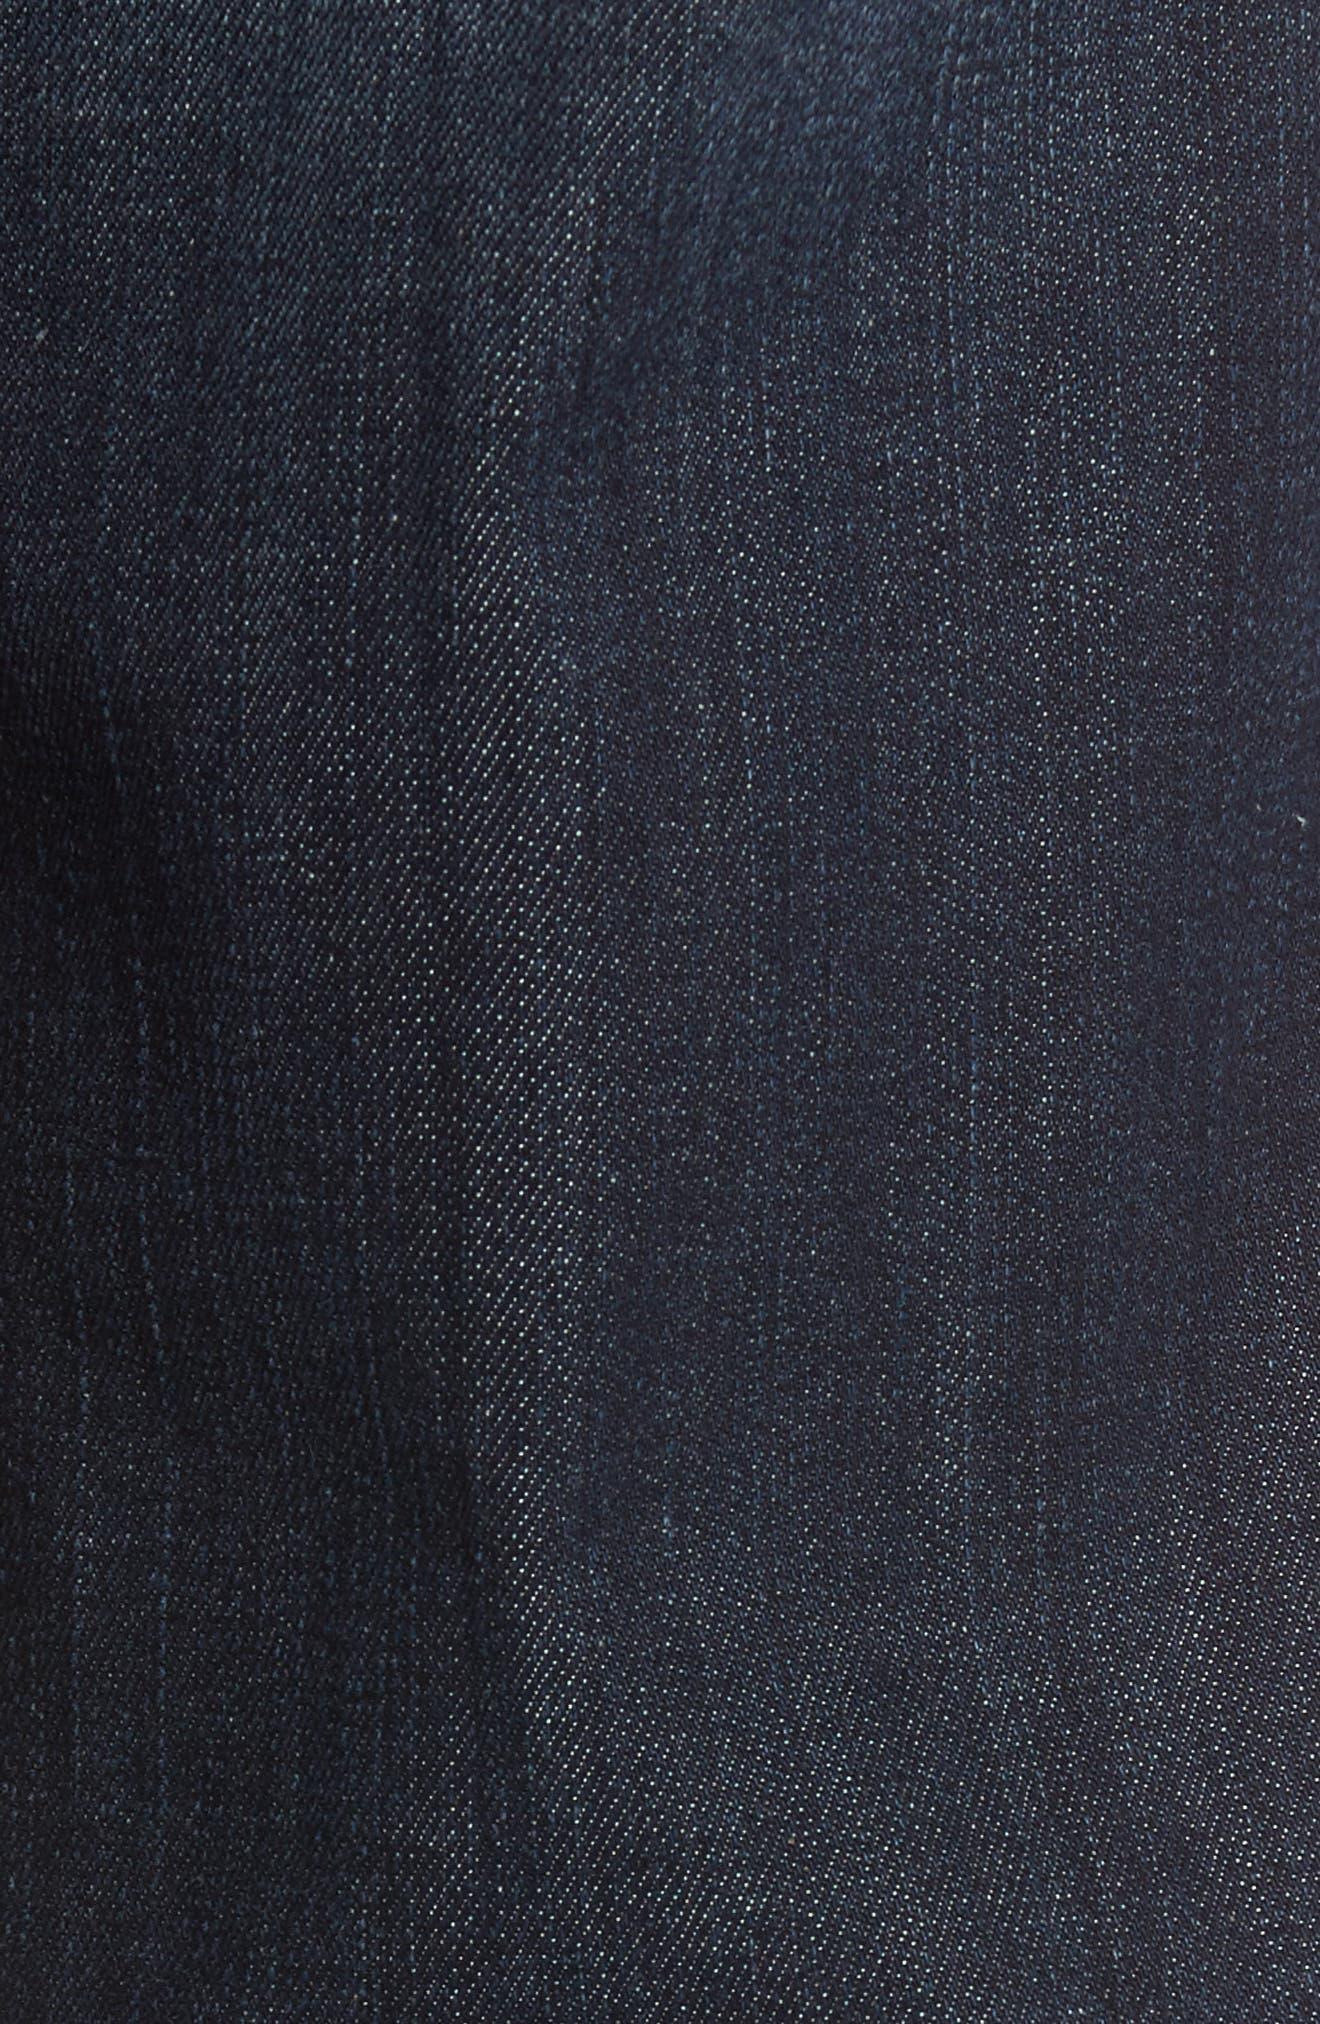 Jimmy Slim Straight Leg Jeans,                             Alternate thumbnail 6, color,                             Scorpion